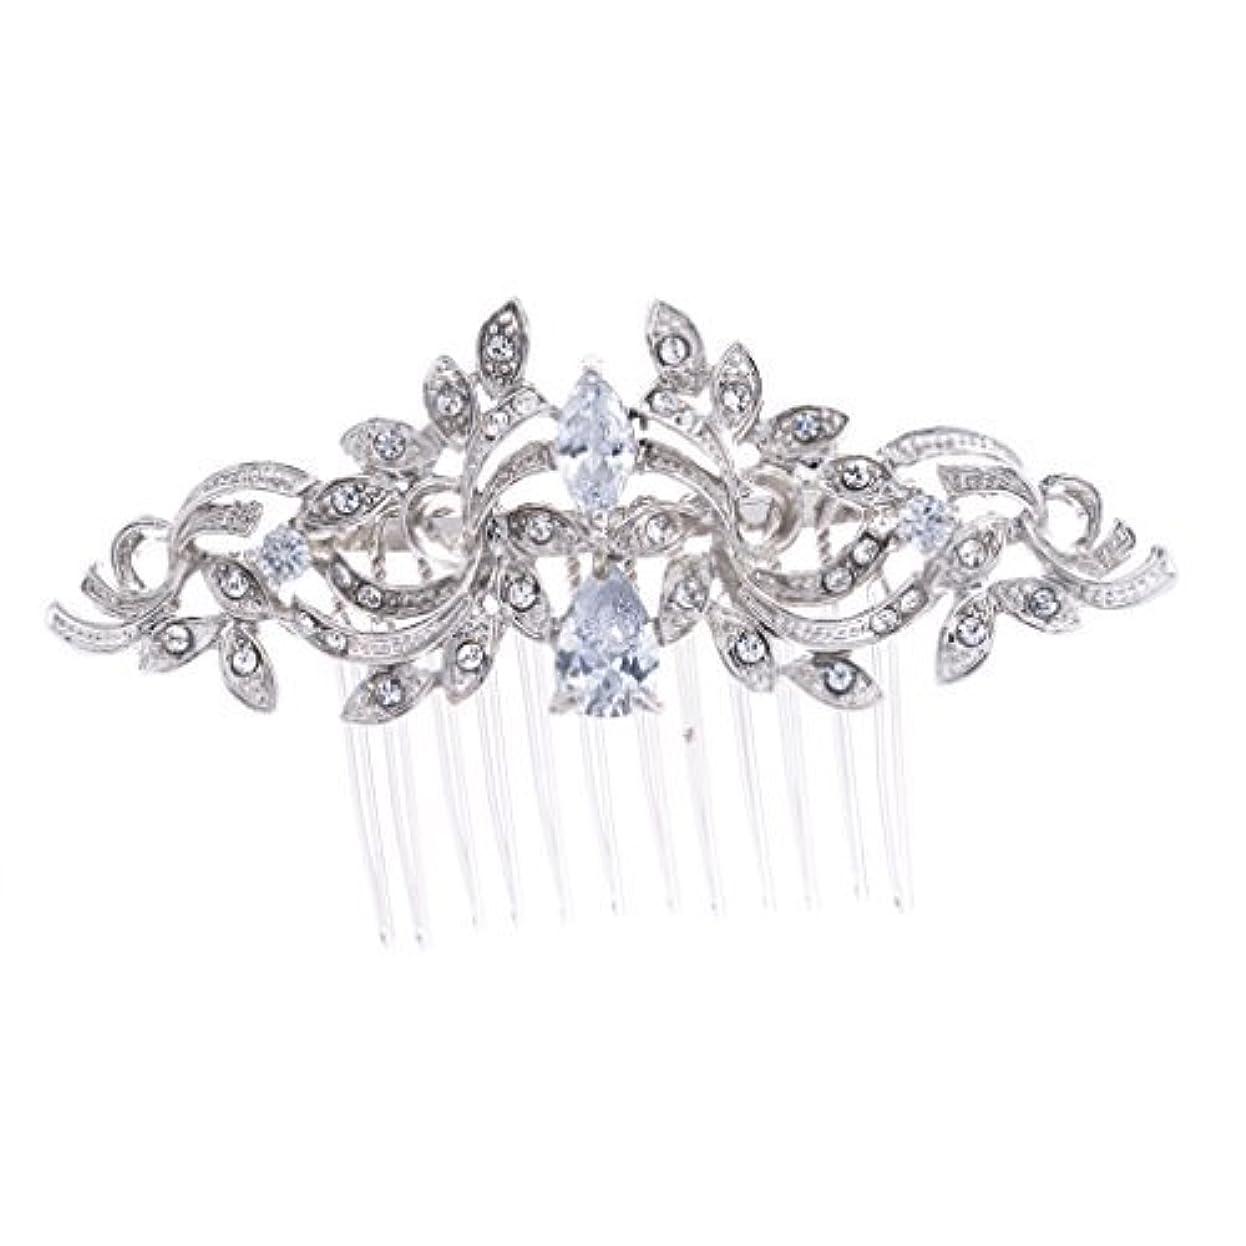 SEPBRIDALS Crystal Rhinestone Leaves Hair Comb Hair Pins Bridal Wedding Hair Accessories Jewelry 4012R [並行輸入品]